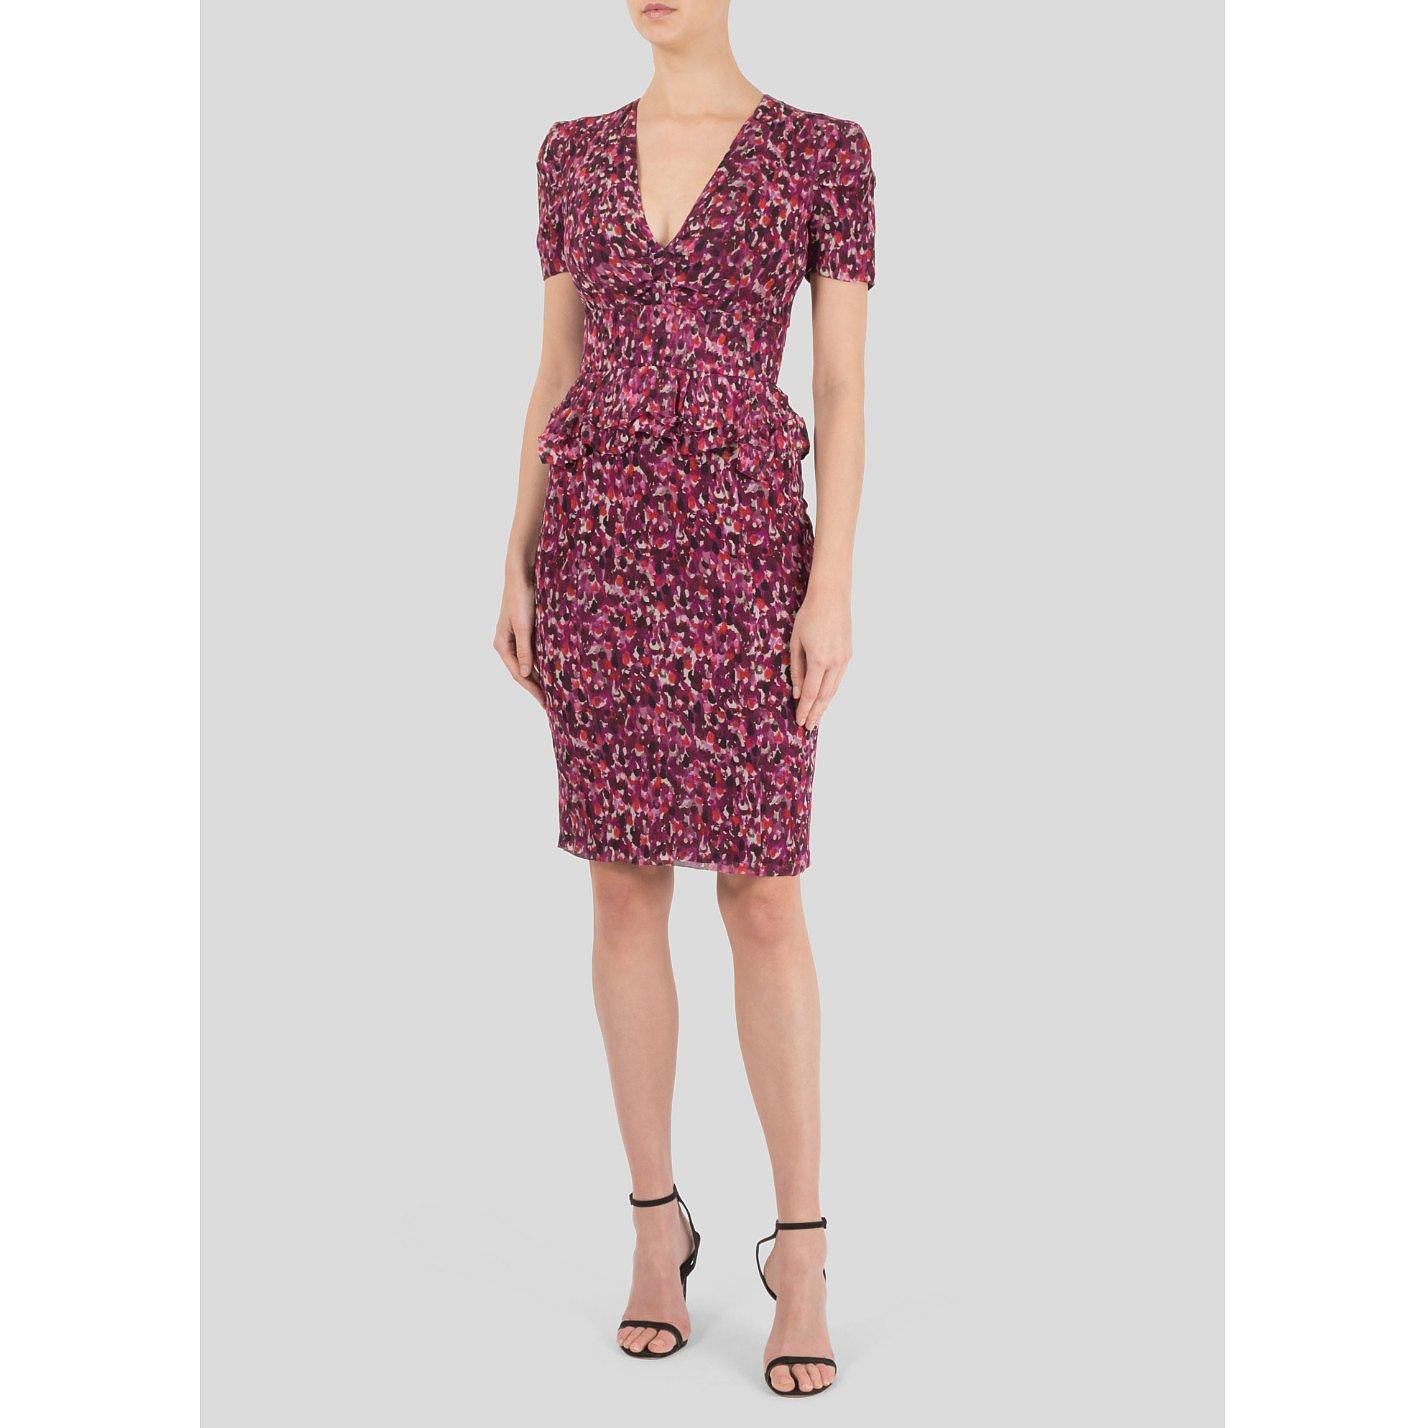 Burberry Floral Print Dress